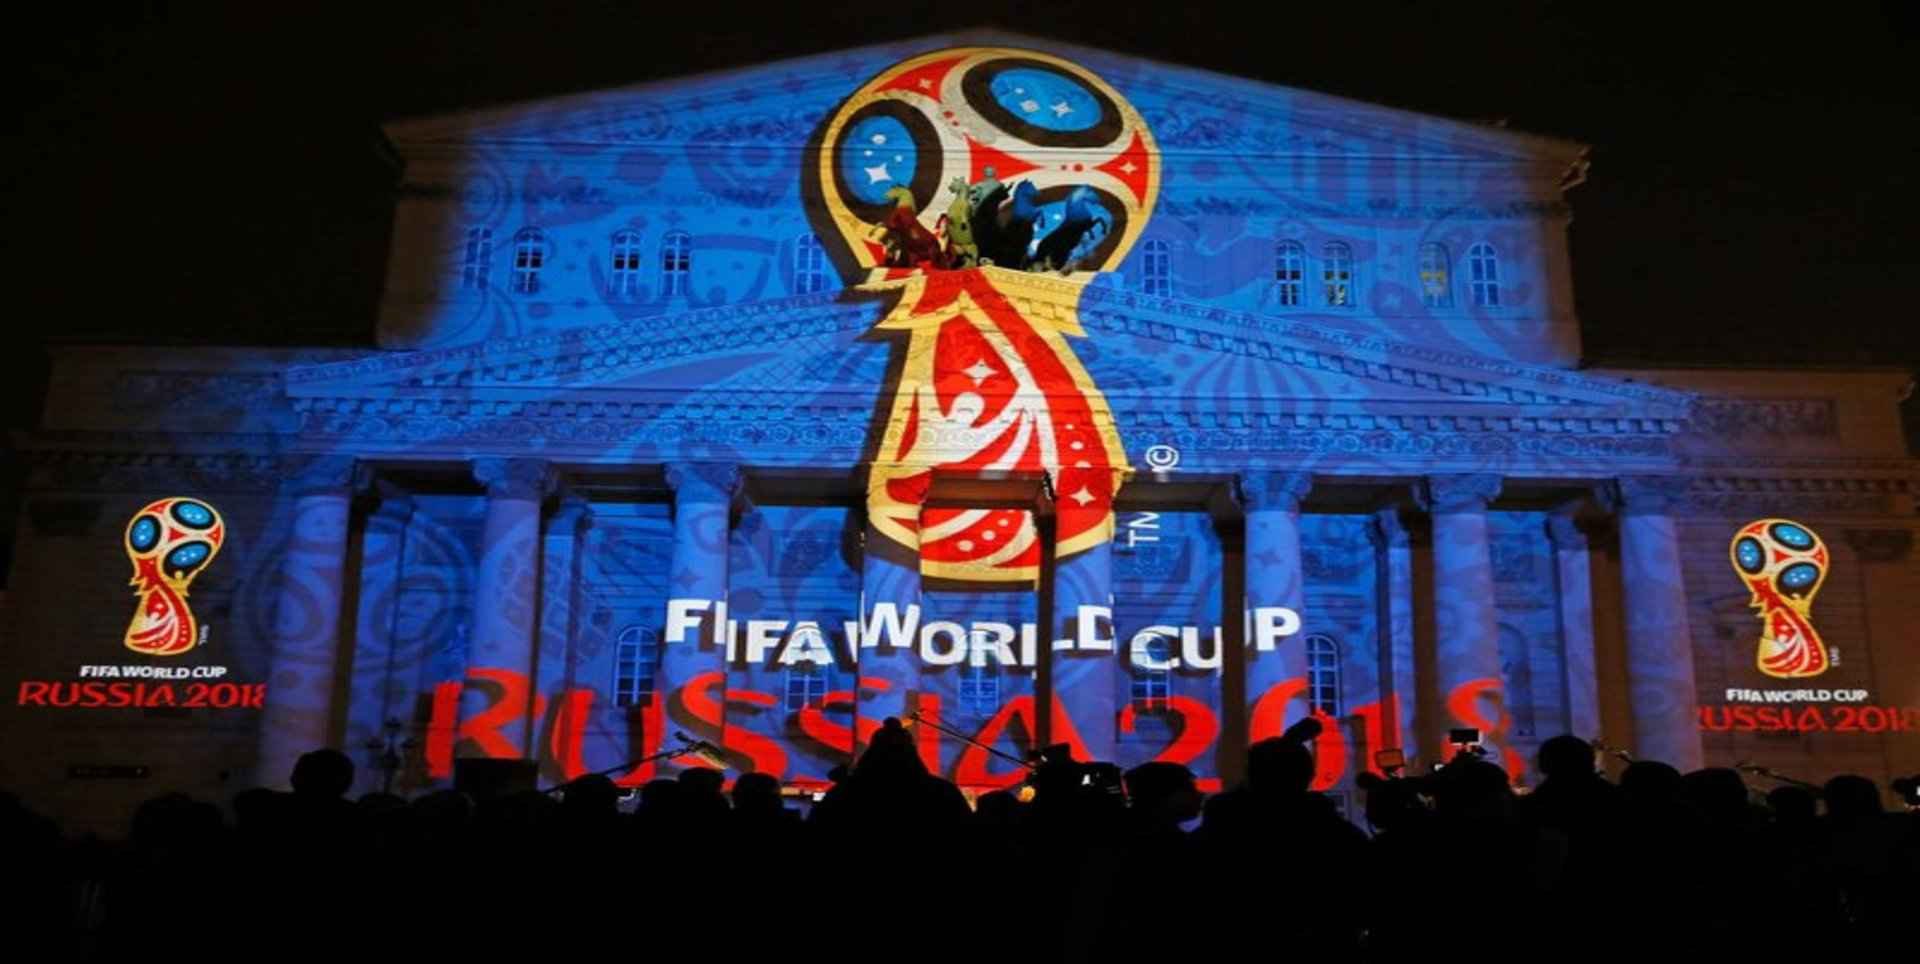 argentina vs germany 13 July 2014 FIFA Final Highlights